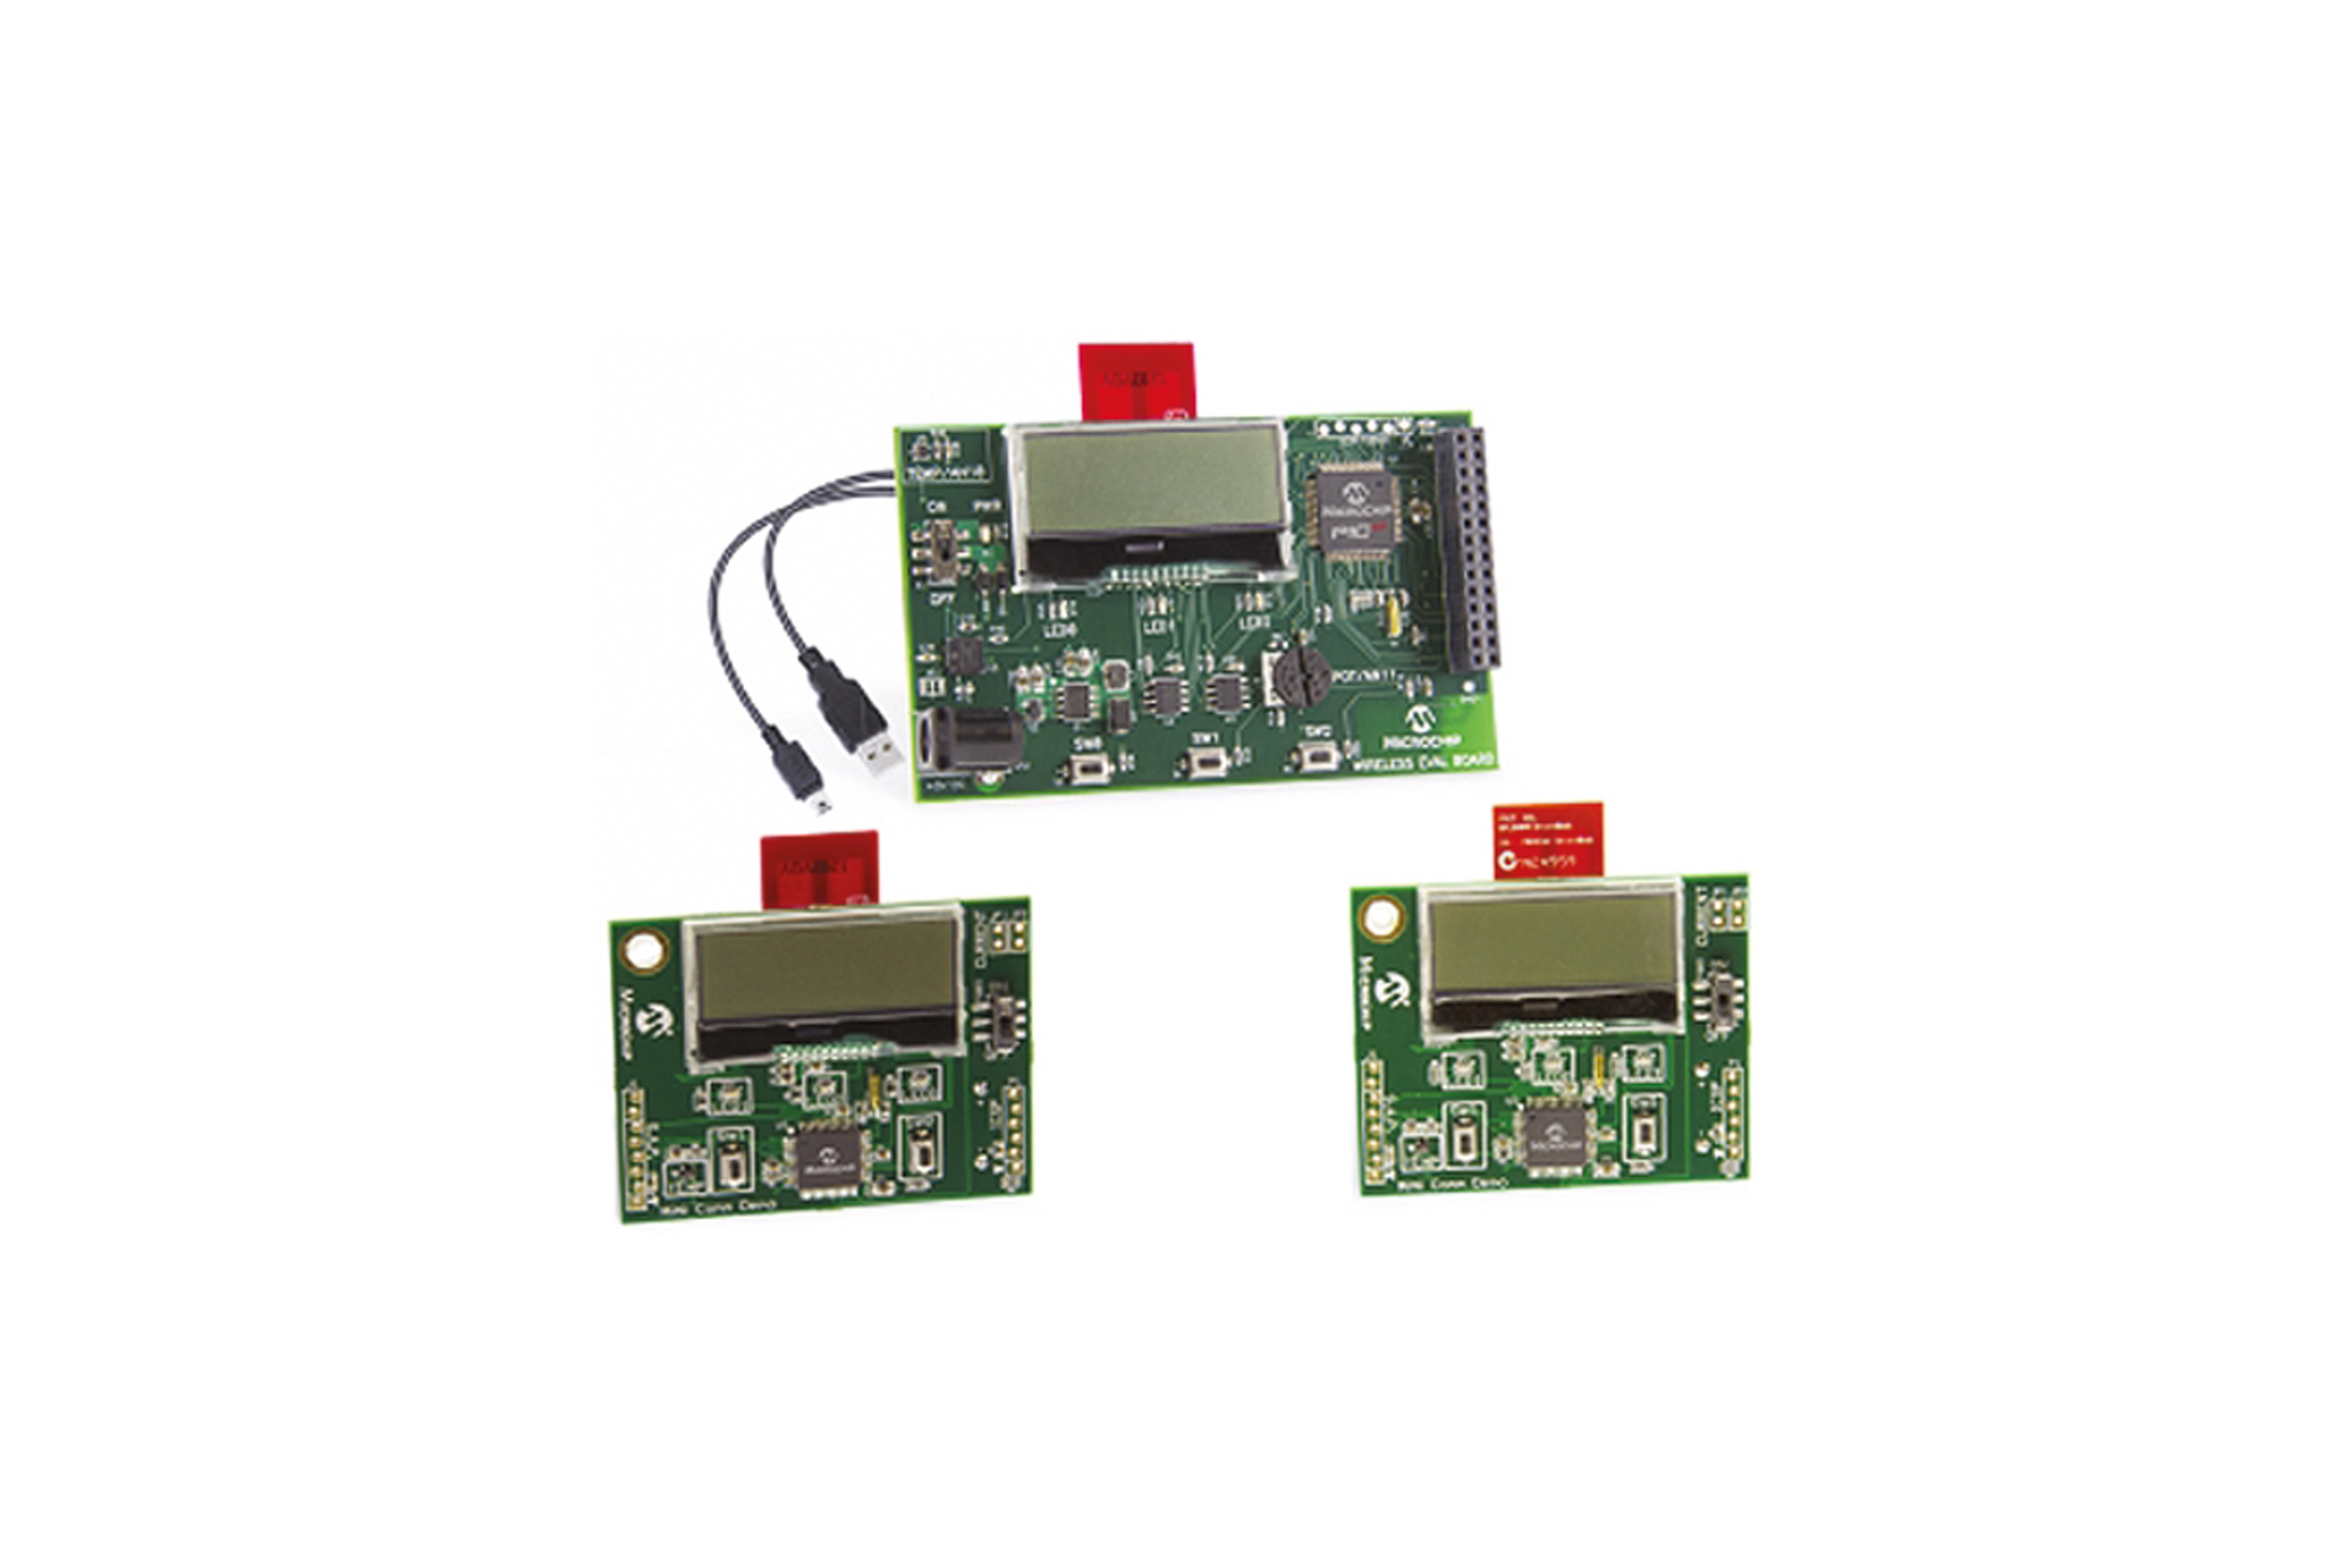 Kit dimostrativo Microchip MiWi / WiFi 2.4GHz per MRF24J/W